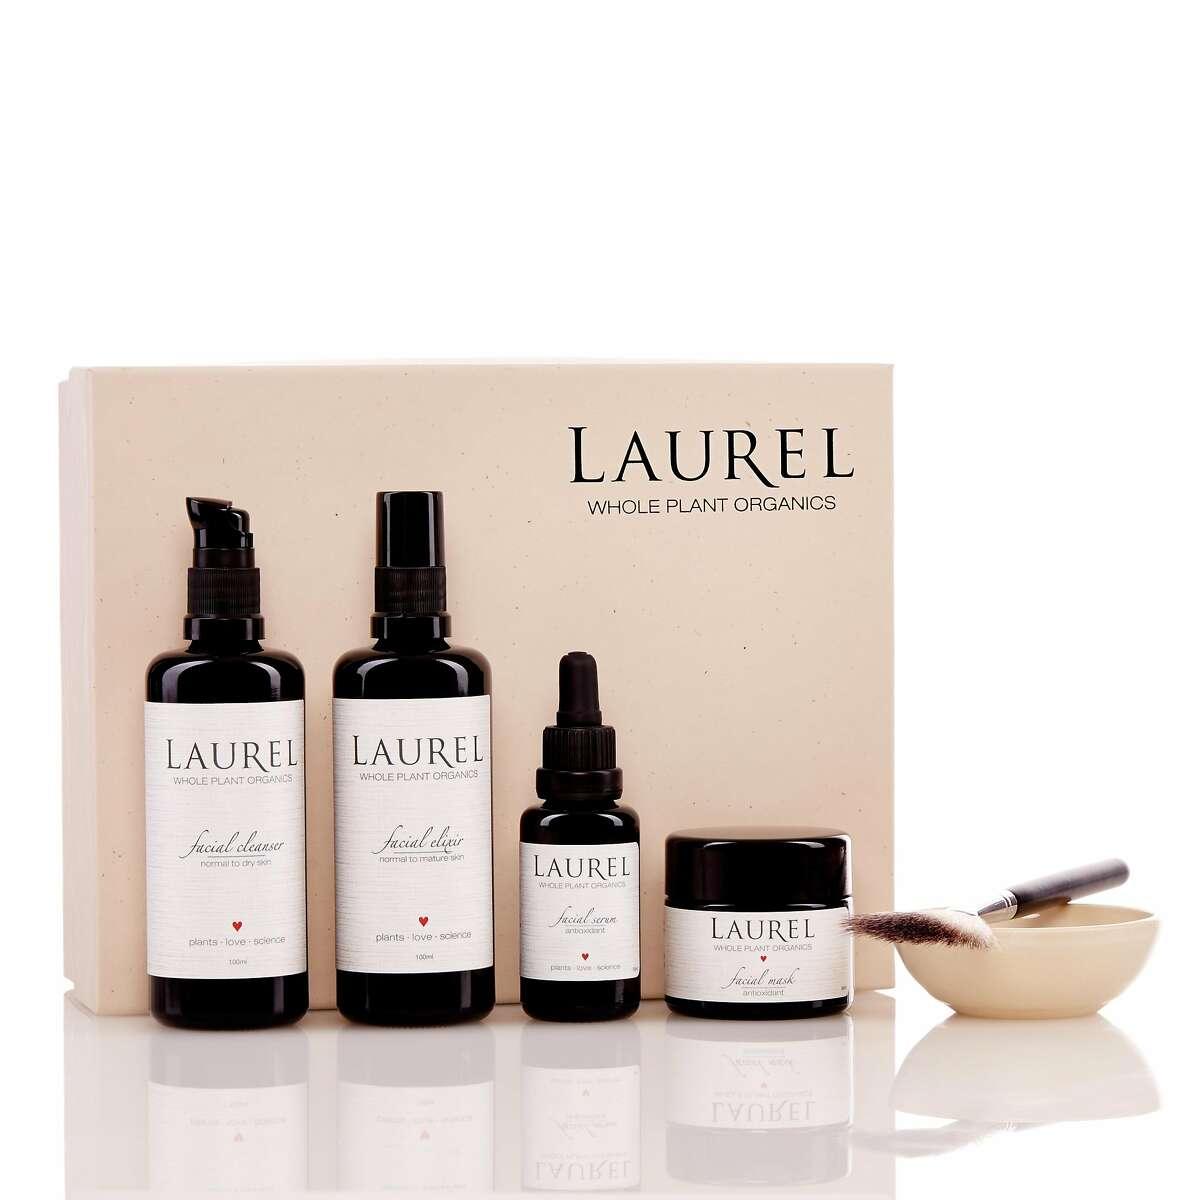 Laurel Whole Plant Organics new full-sized gift boxes. $228, www.laurelskin.com